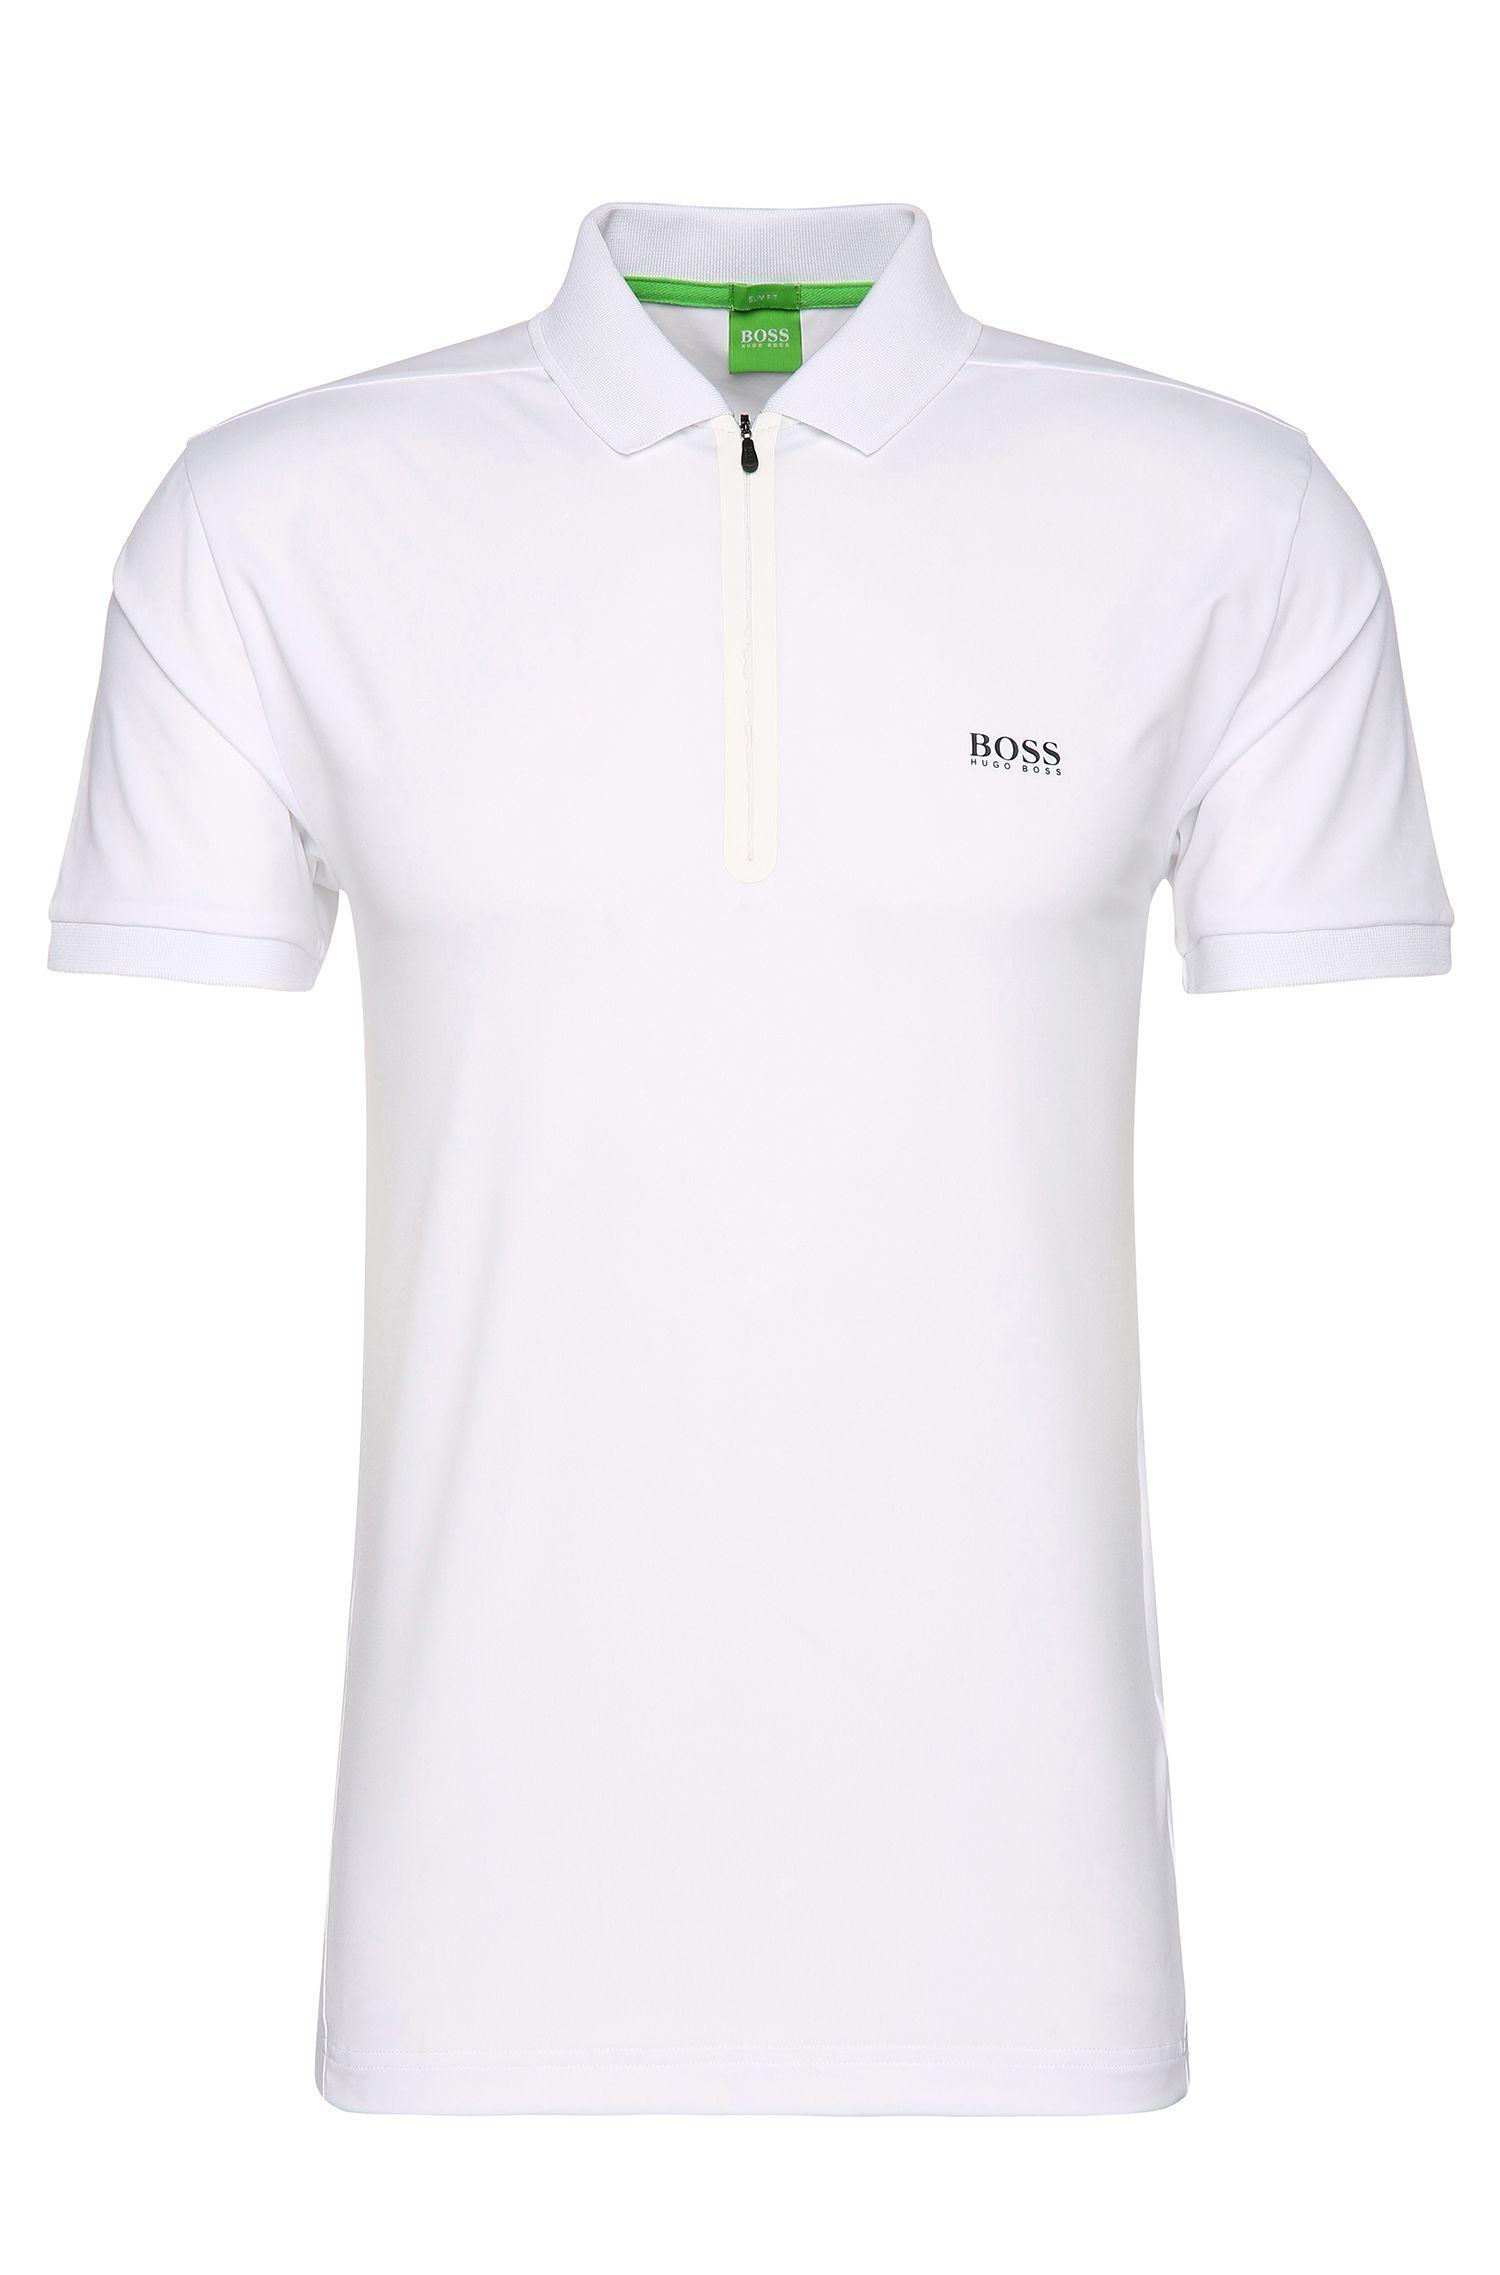 'Pavotech' | Slim Fit, Stretch Techno Jersey Polo Shirt